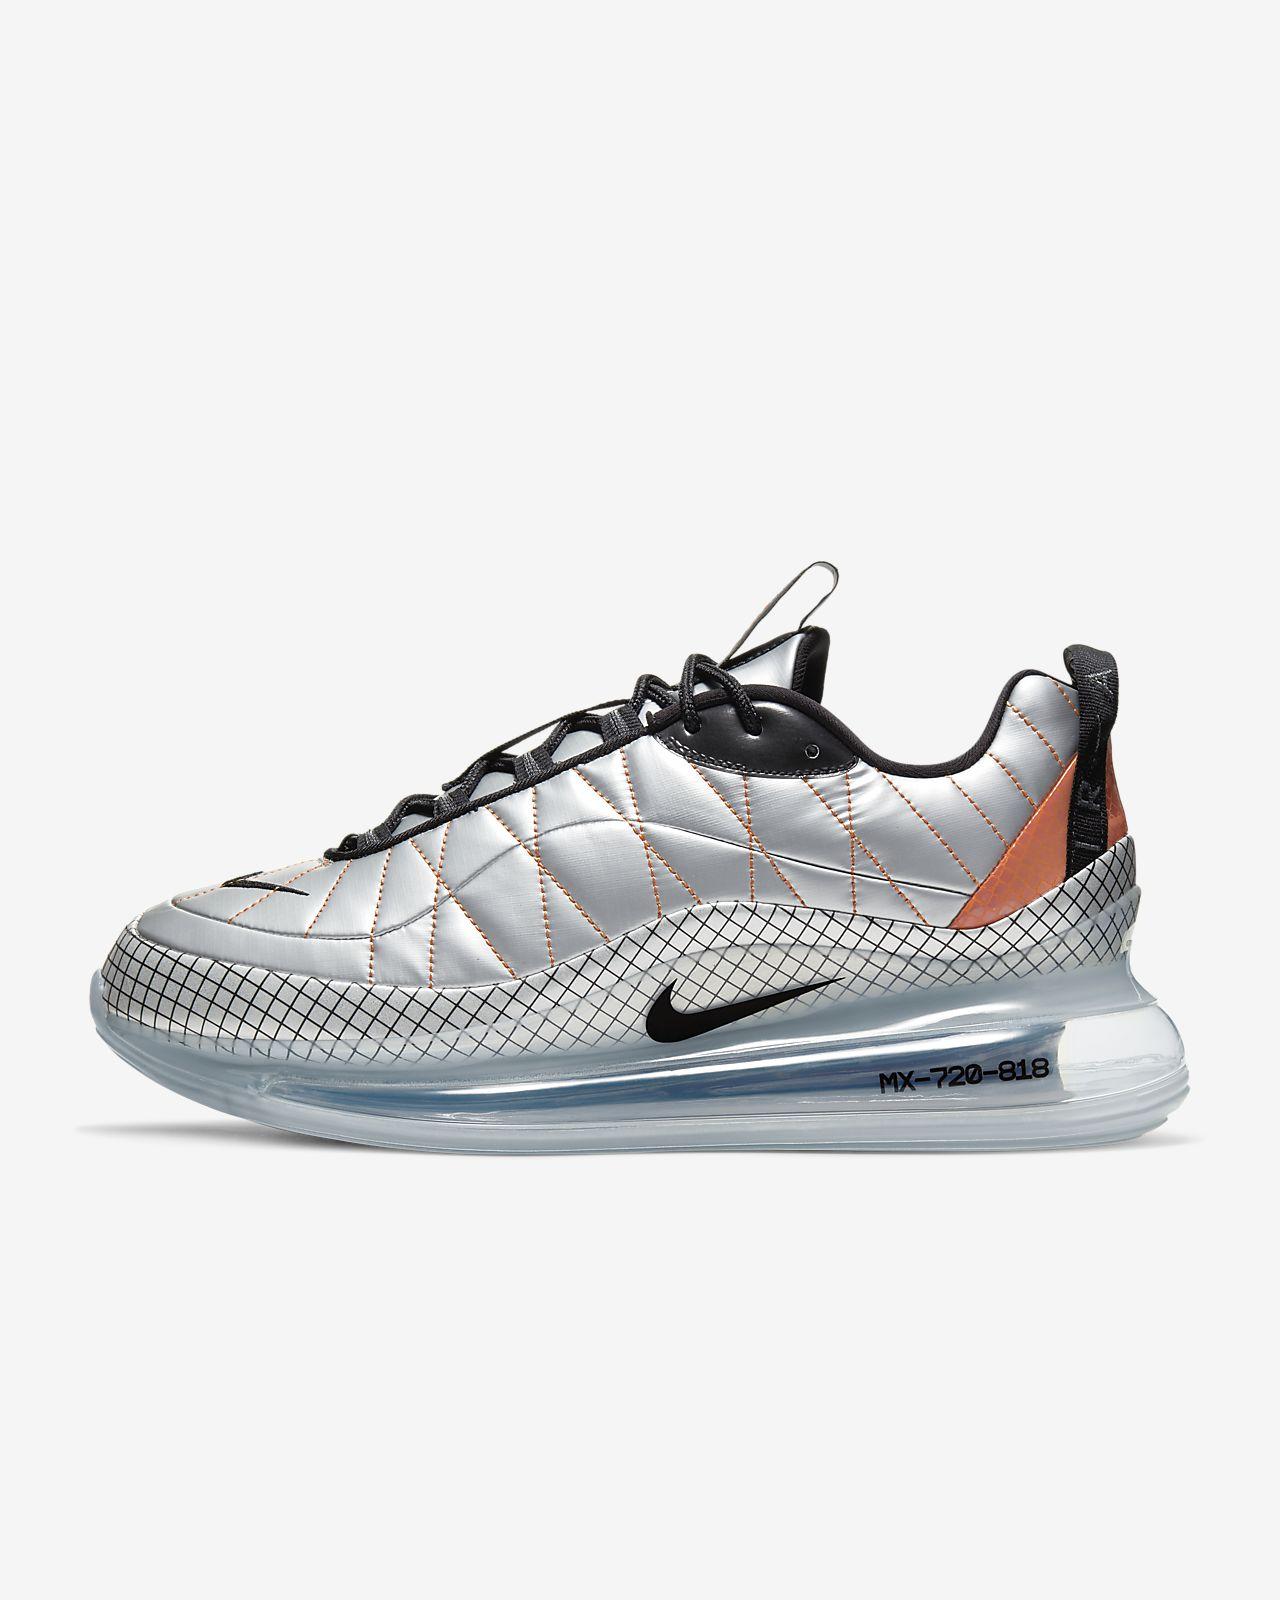 Scarpa Nike MX-720-818 - Uomo